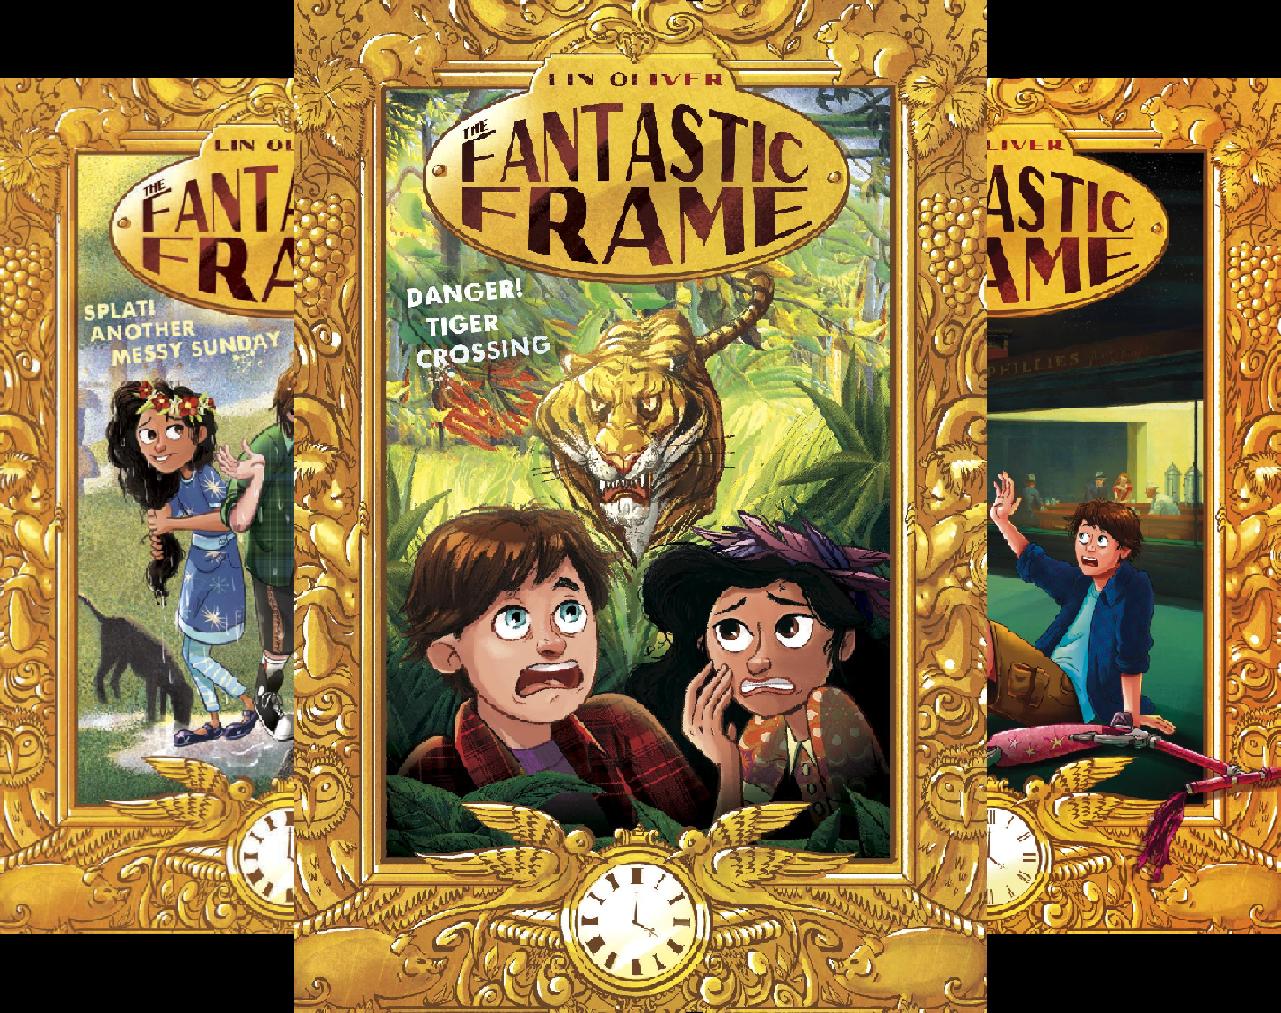 The Fantastic Frame (5 Book Series)